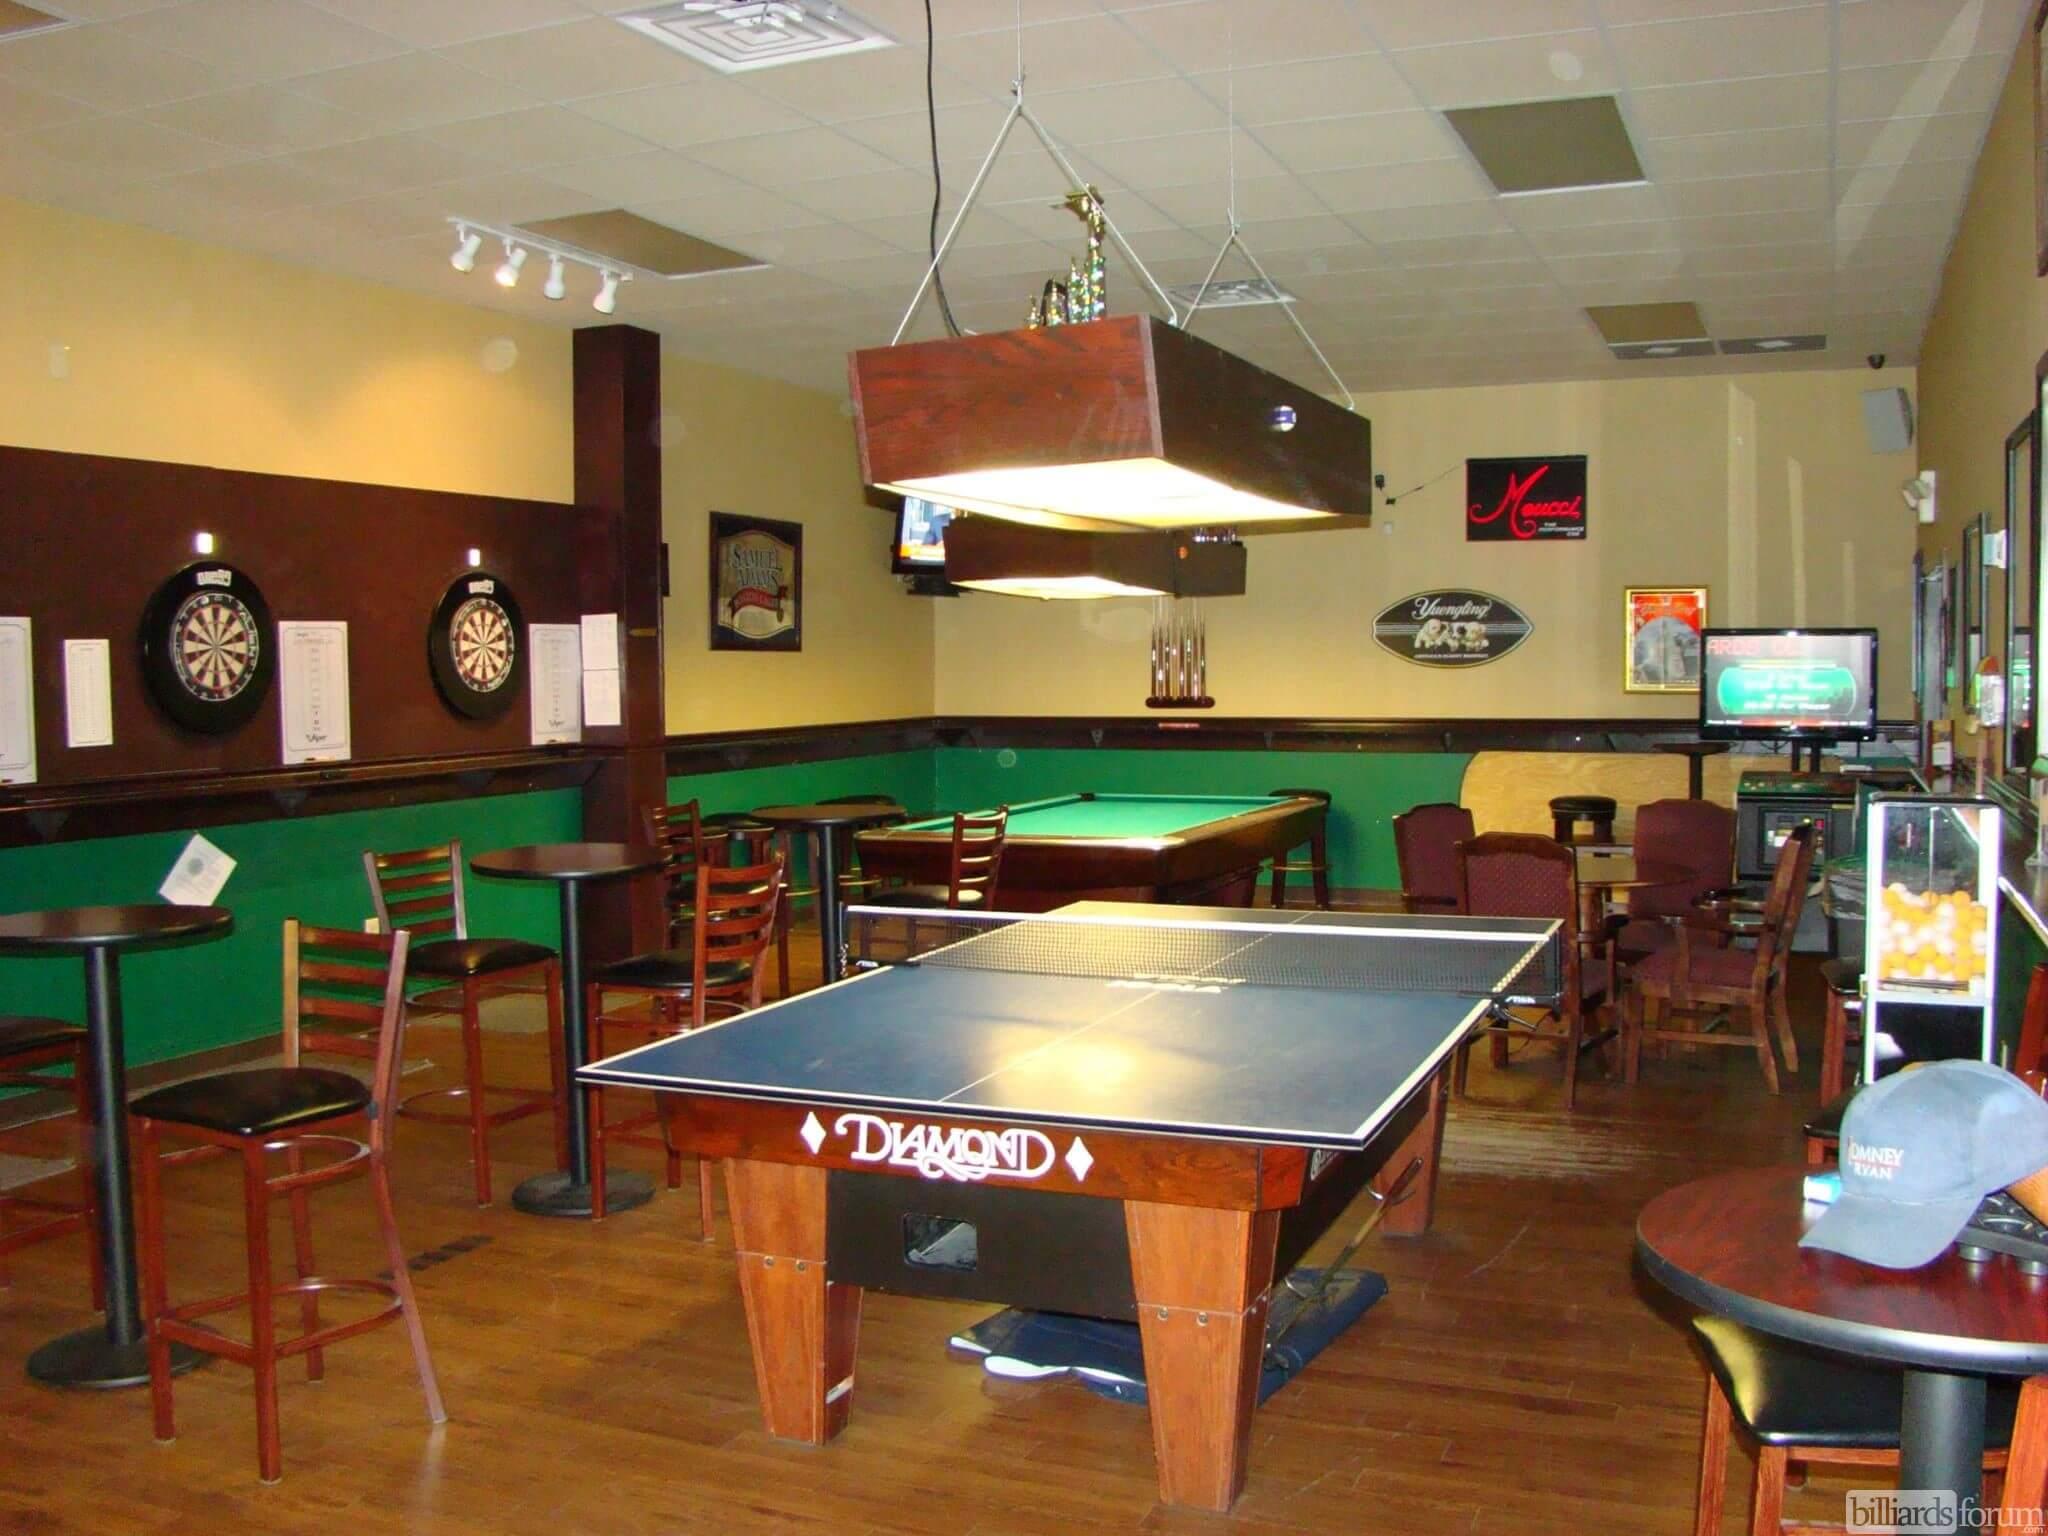 Table Tennis At Gate City Billiards Club Greensboro, NC